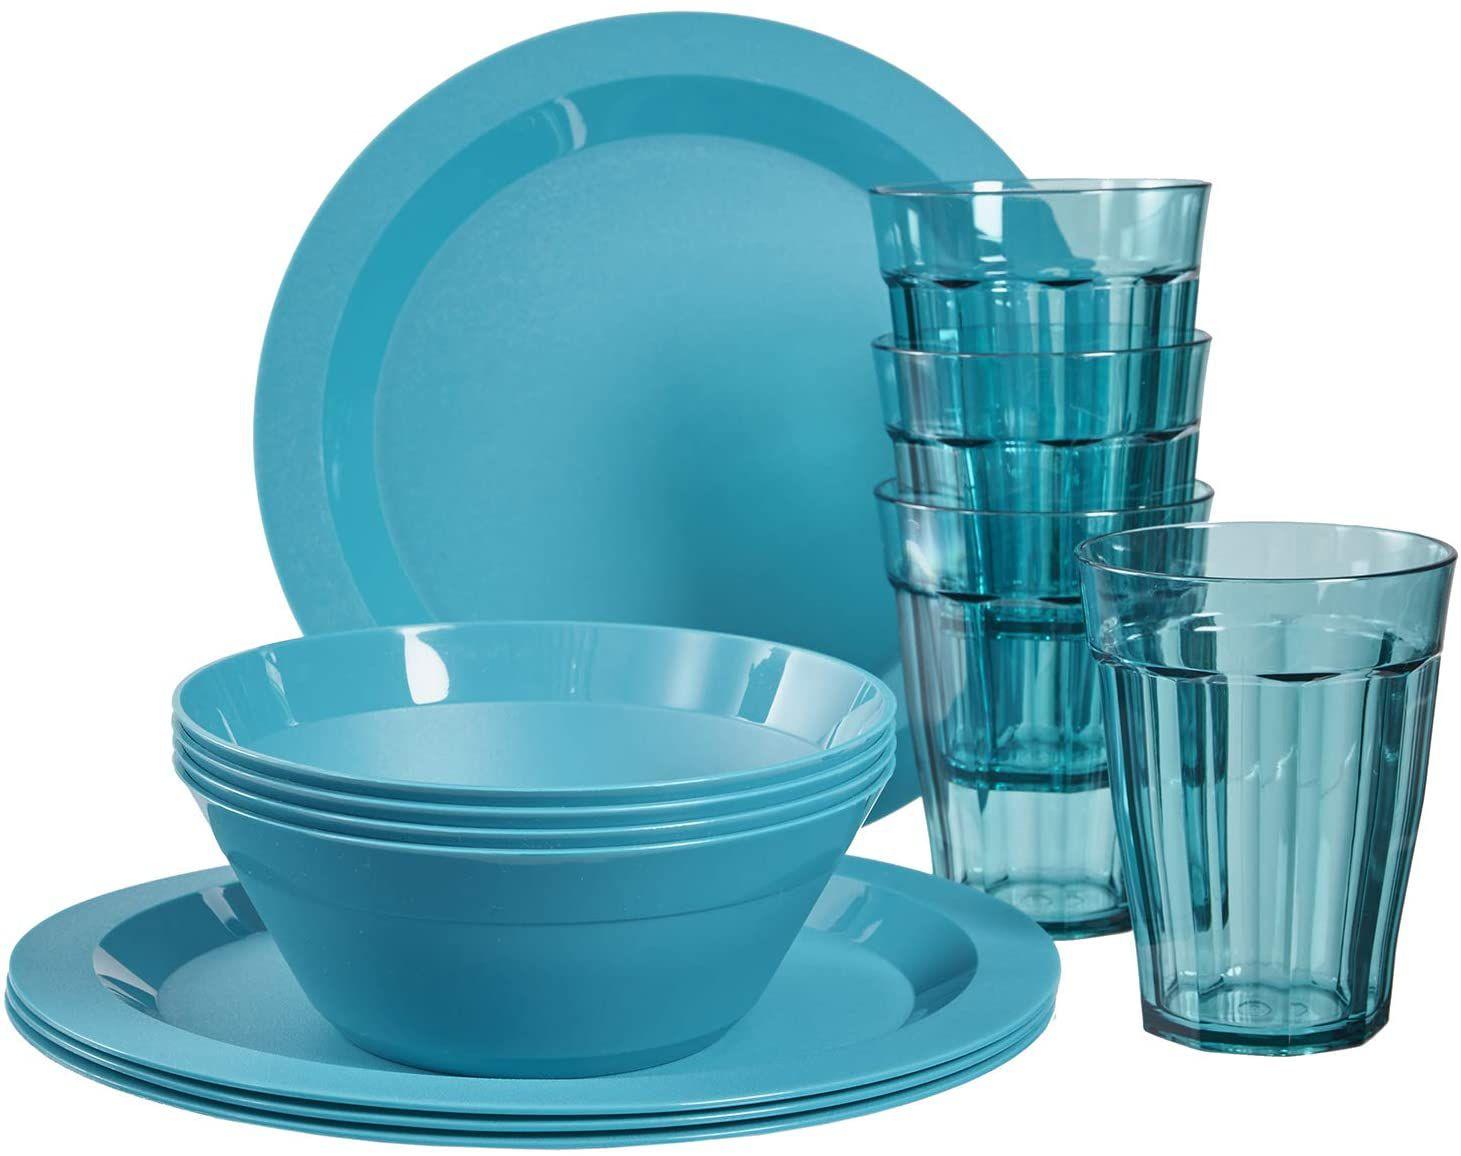 Cambridge Plastic Plate, Bowl and Tumbler Dinnerware